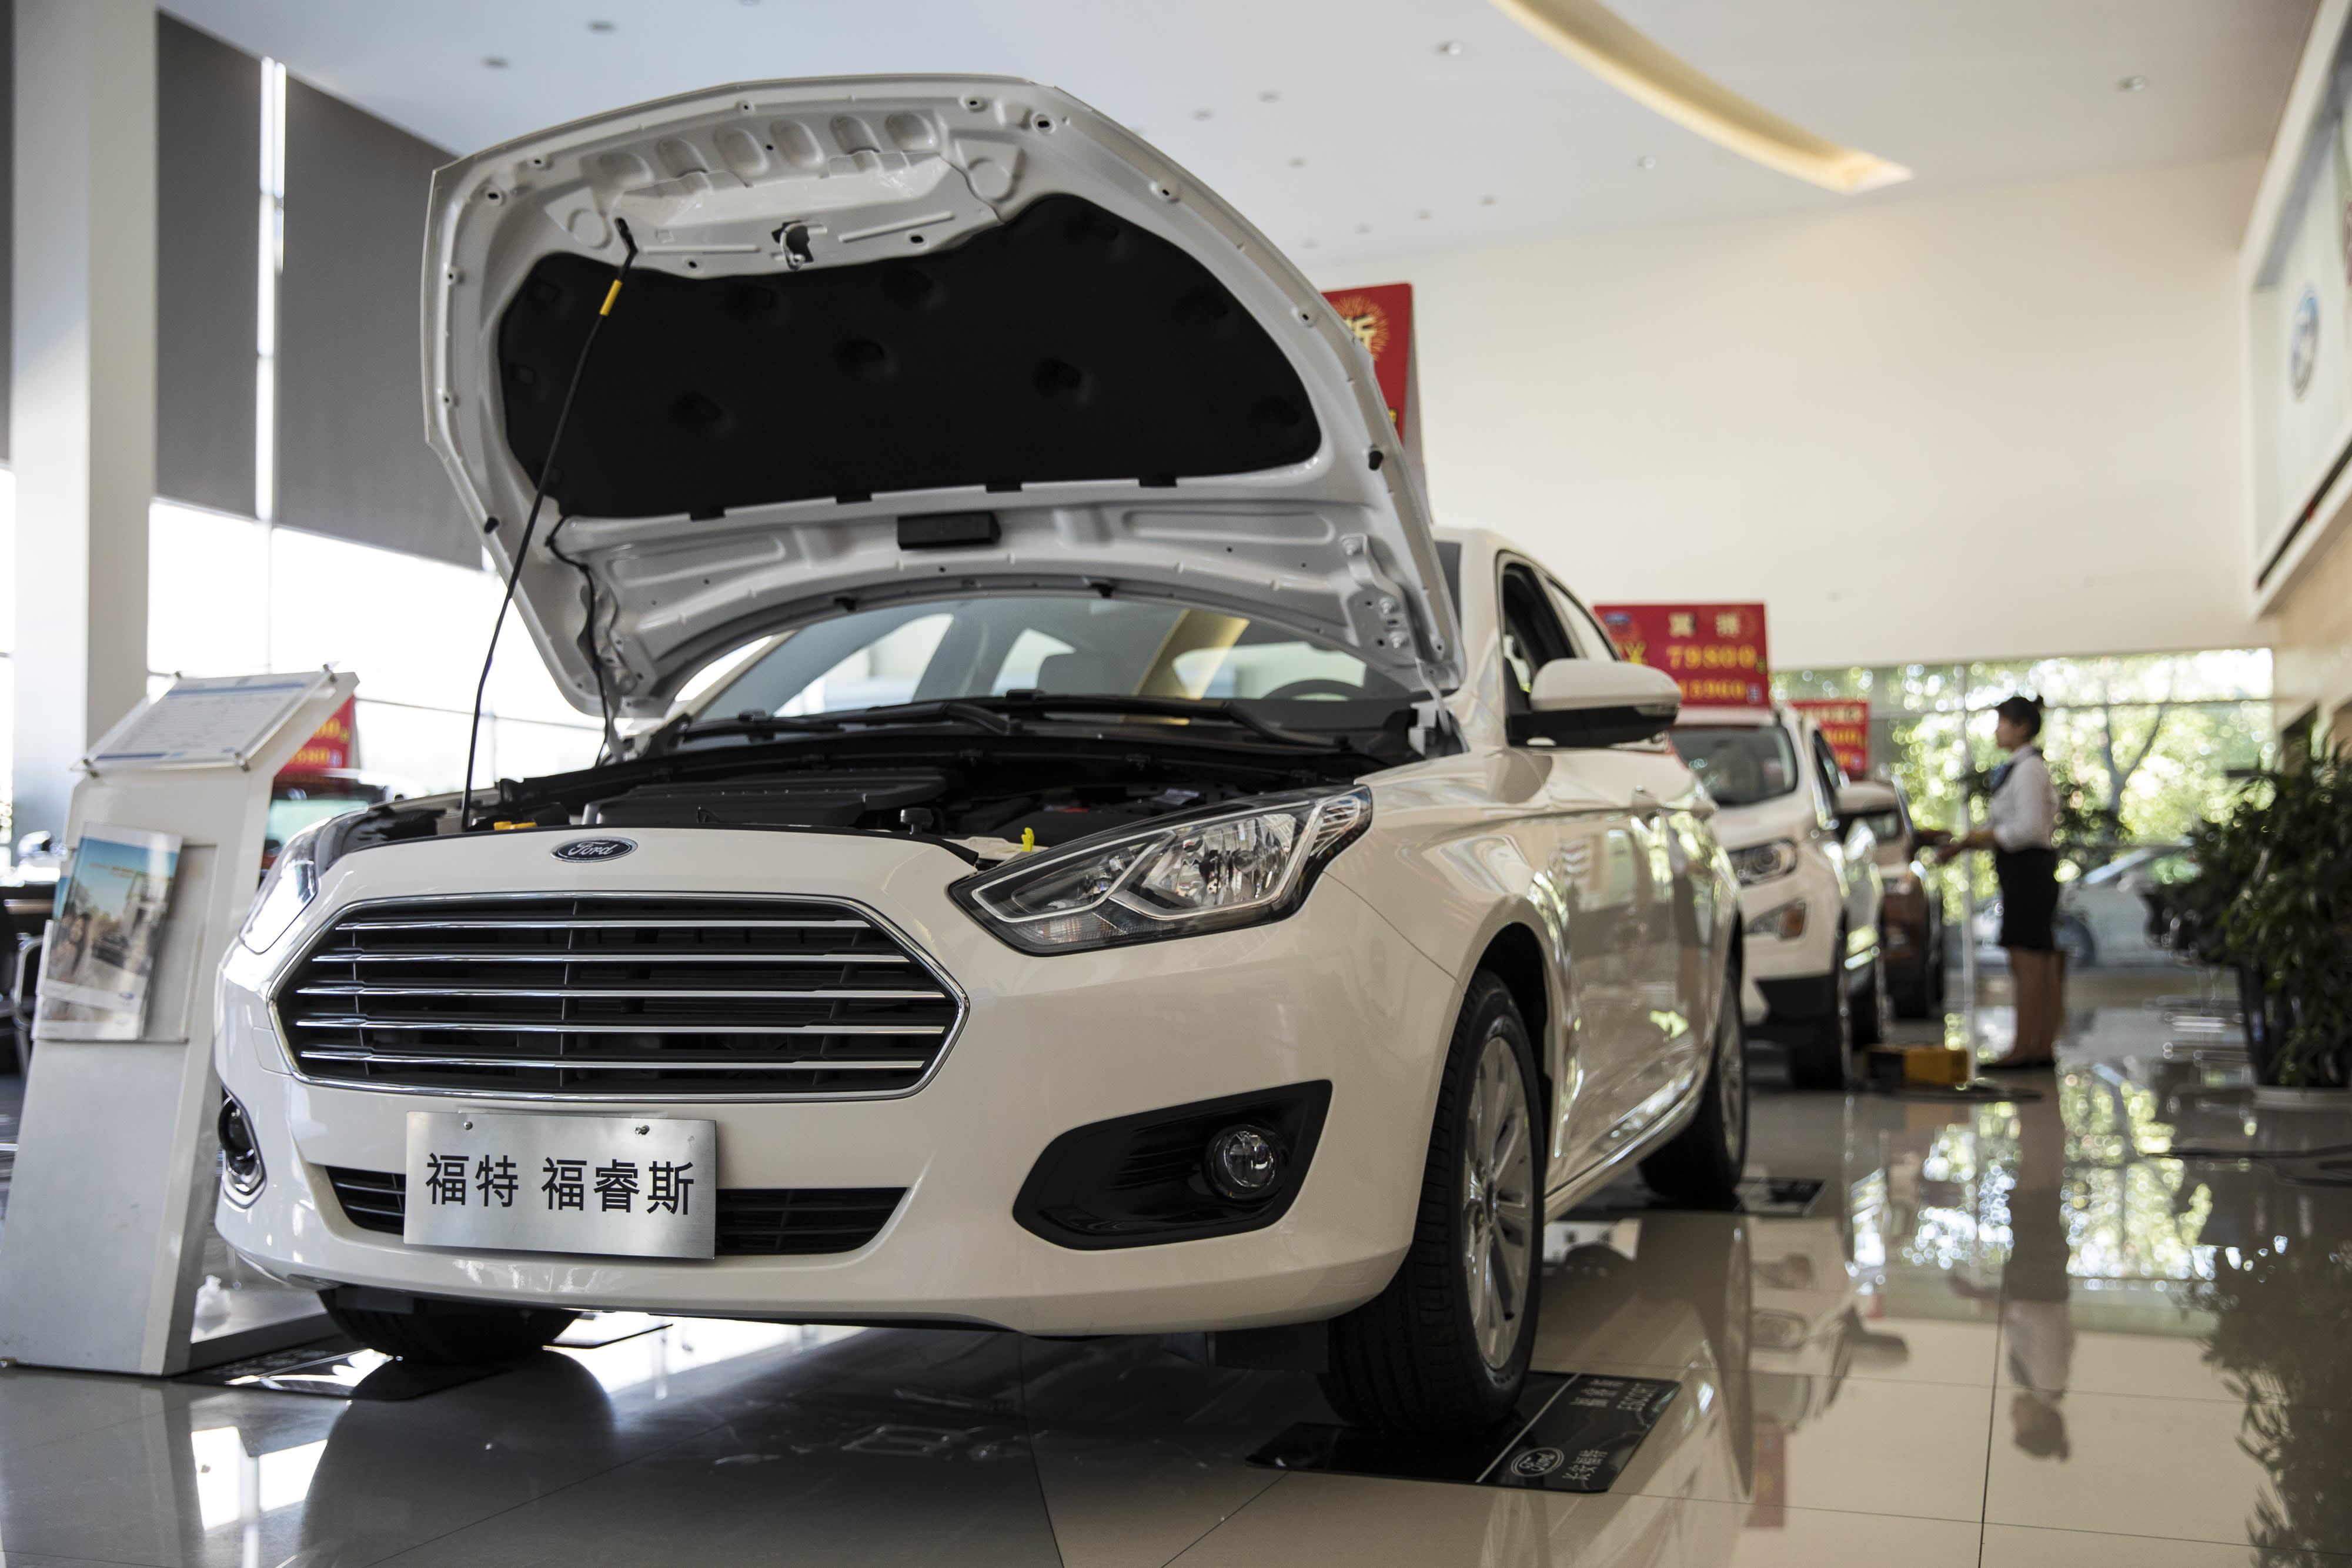 Ford's China sales decline again despite new models